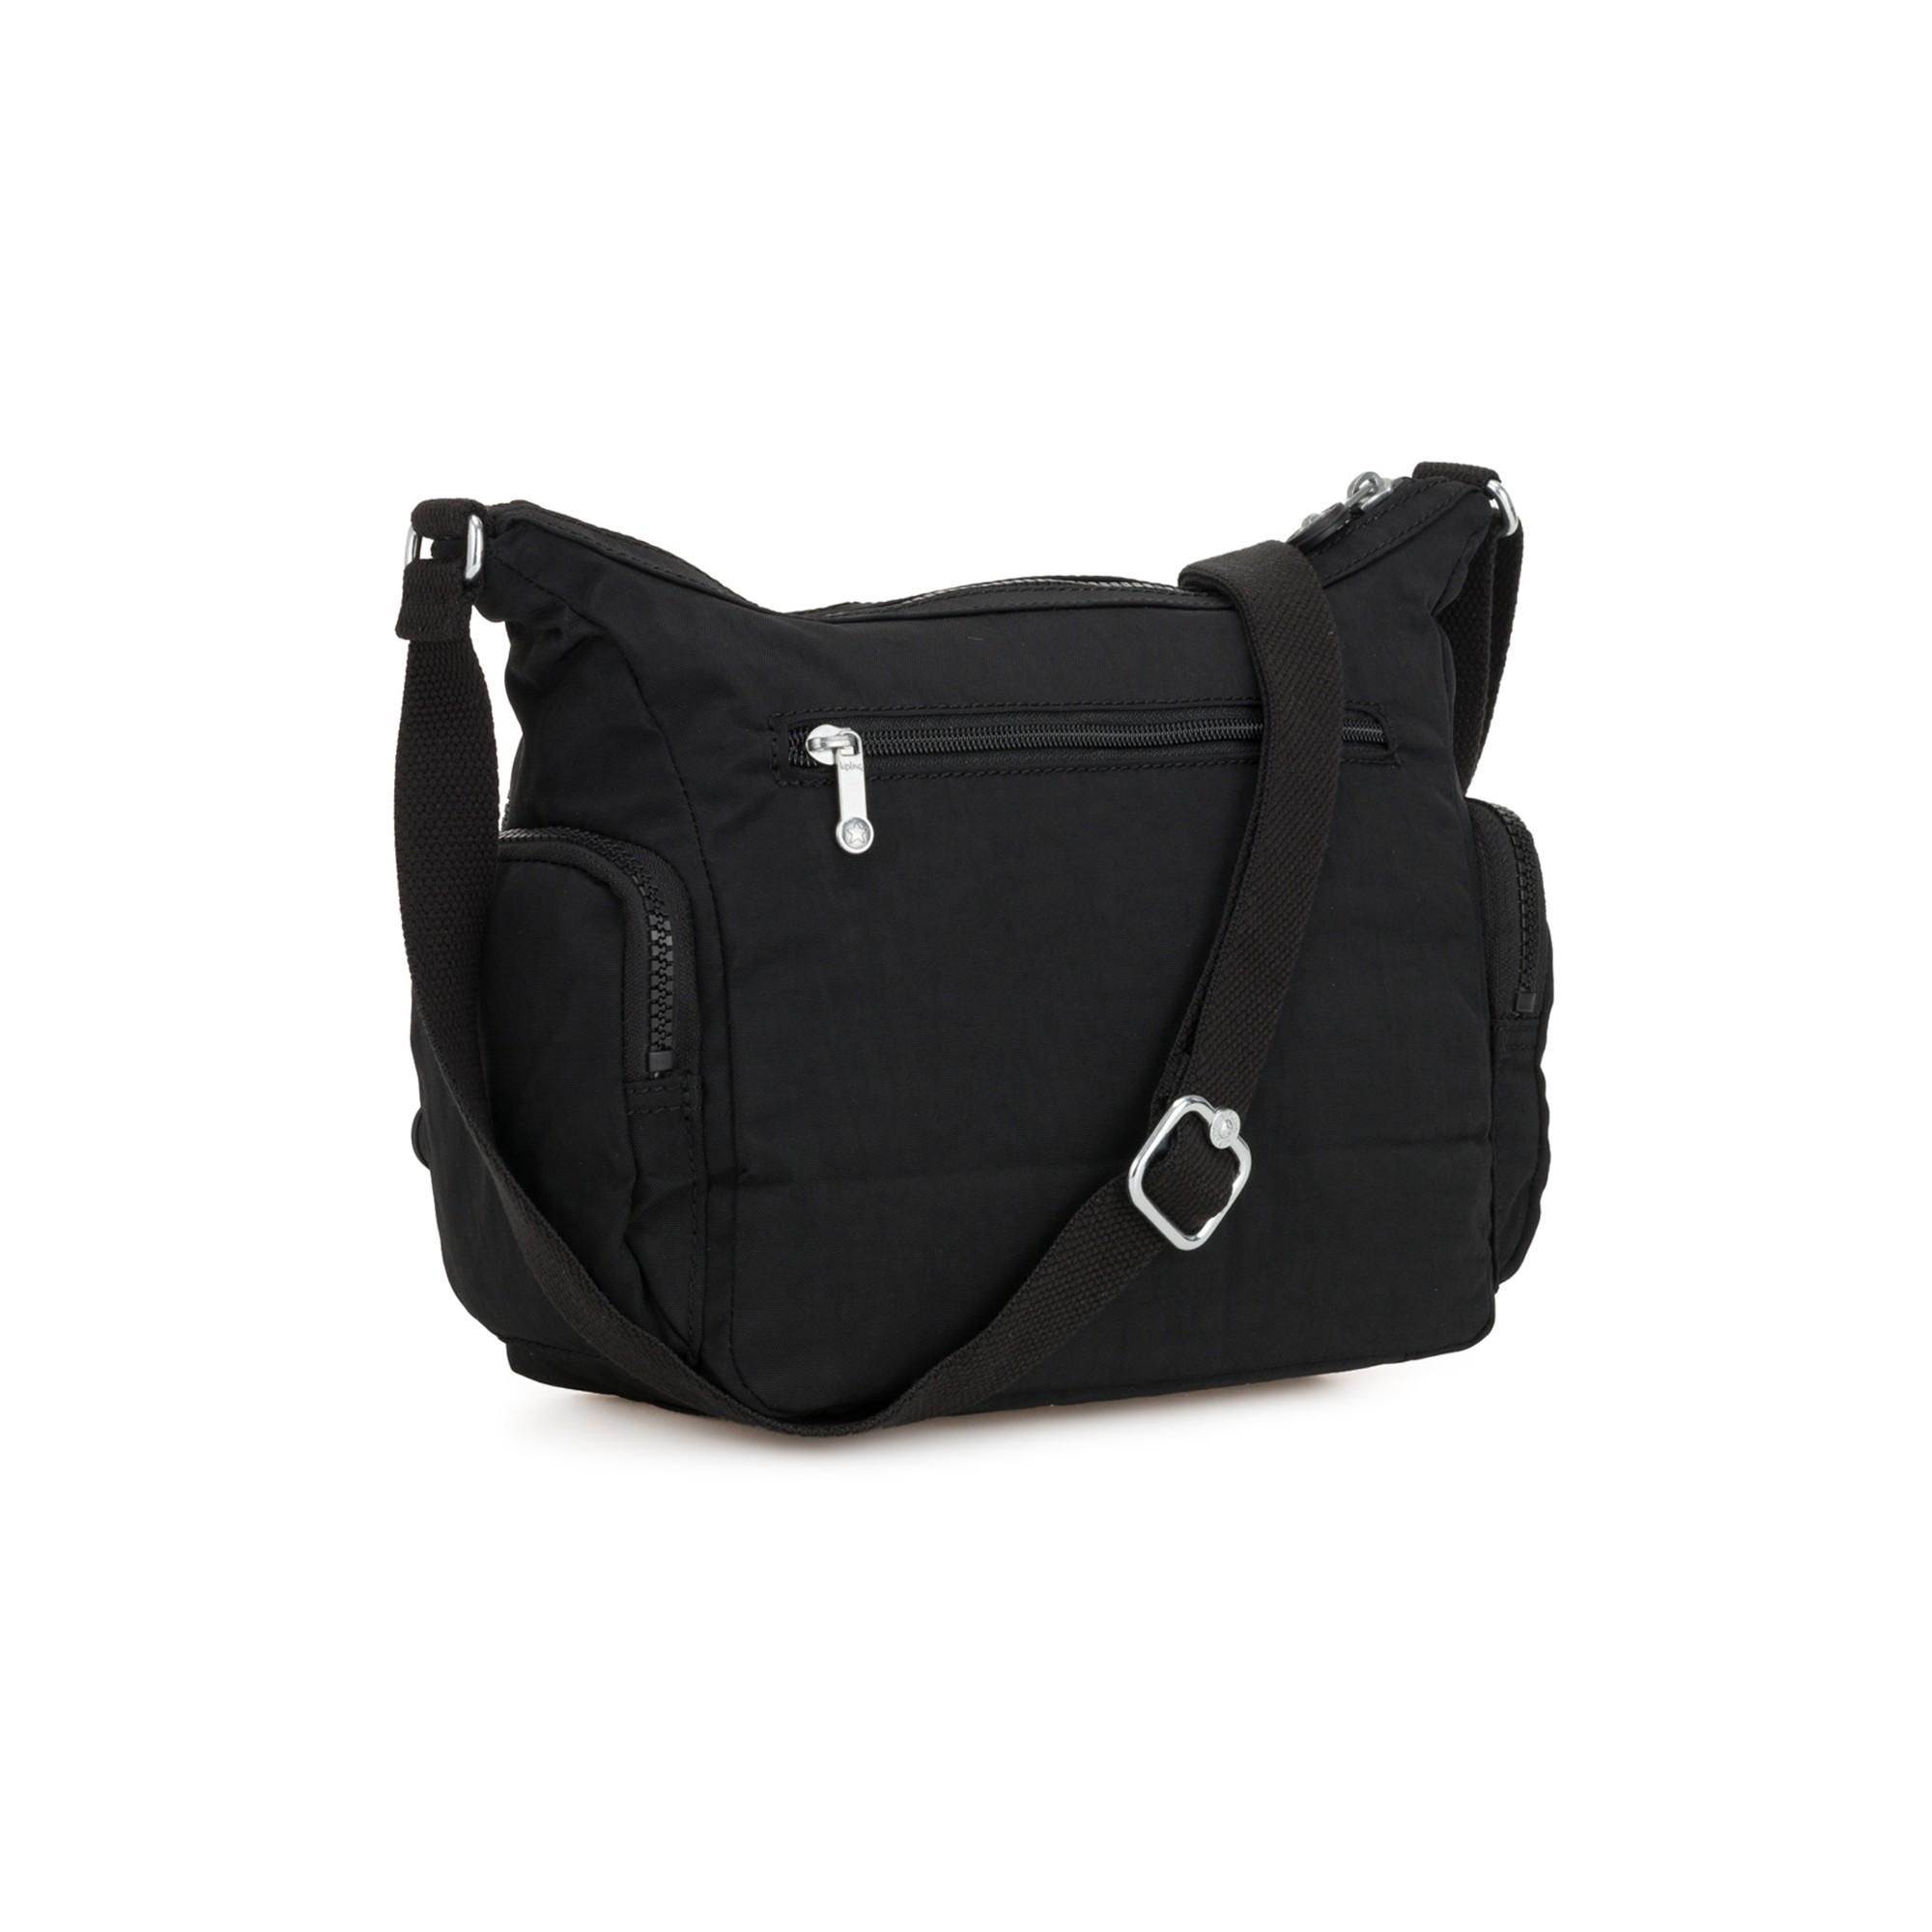 KIPLING Bag KI2531 TRUE BLACK